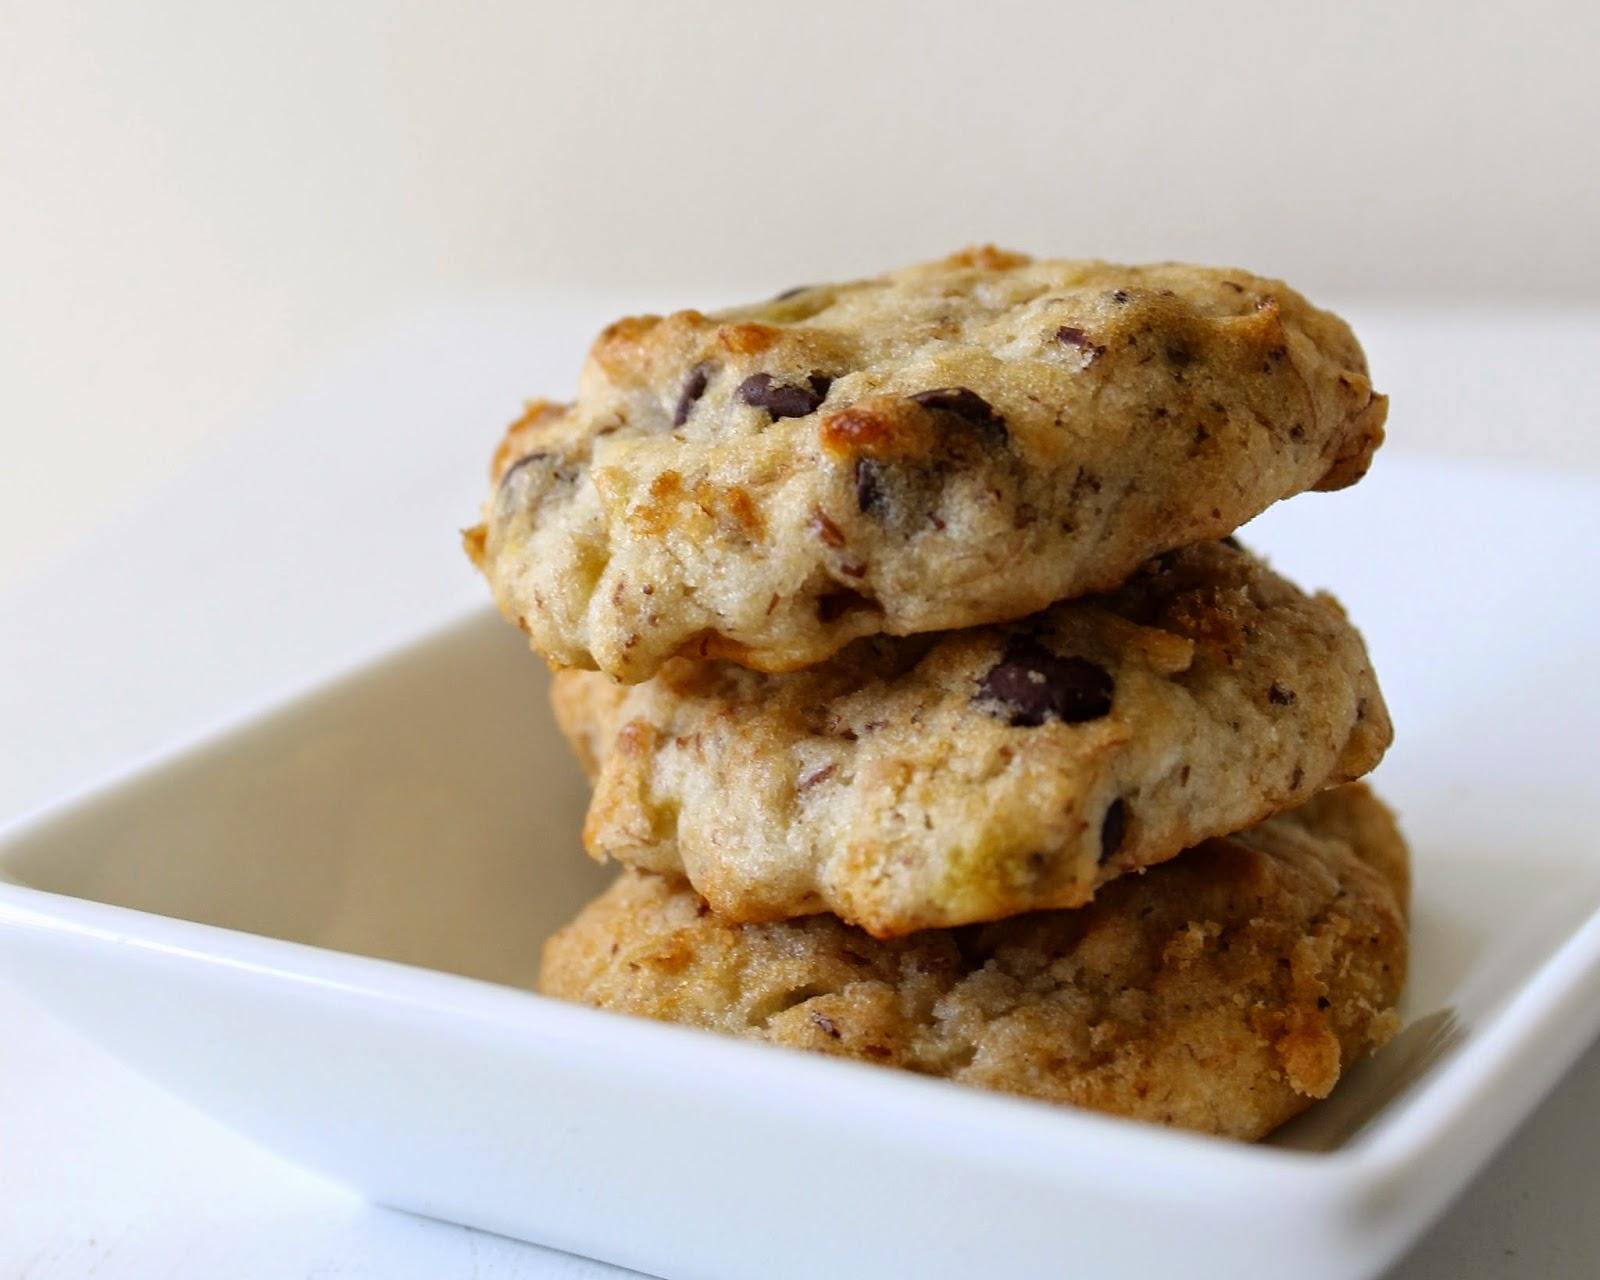 ... - The Best Gluten Free: Gluten Free Banana Chocolate Chip Cookies